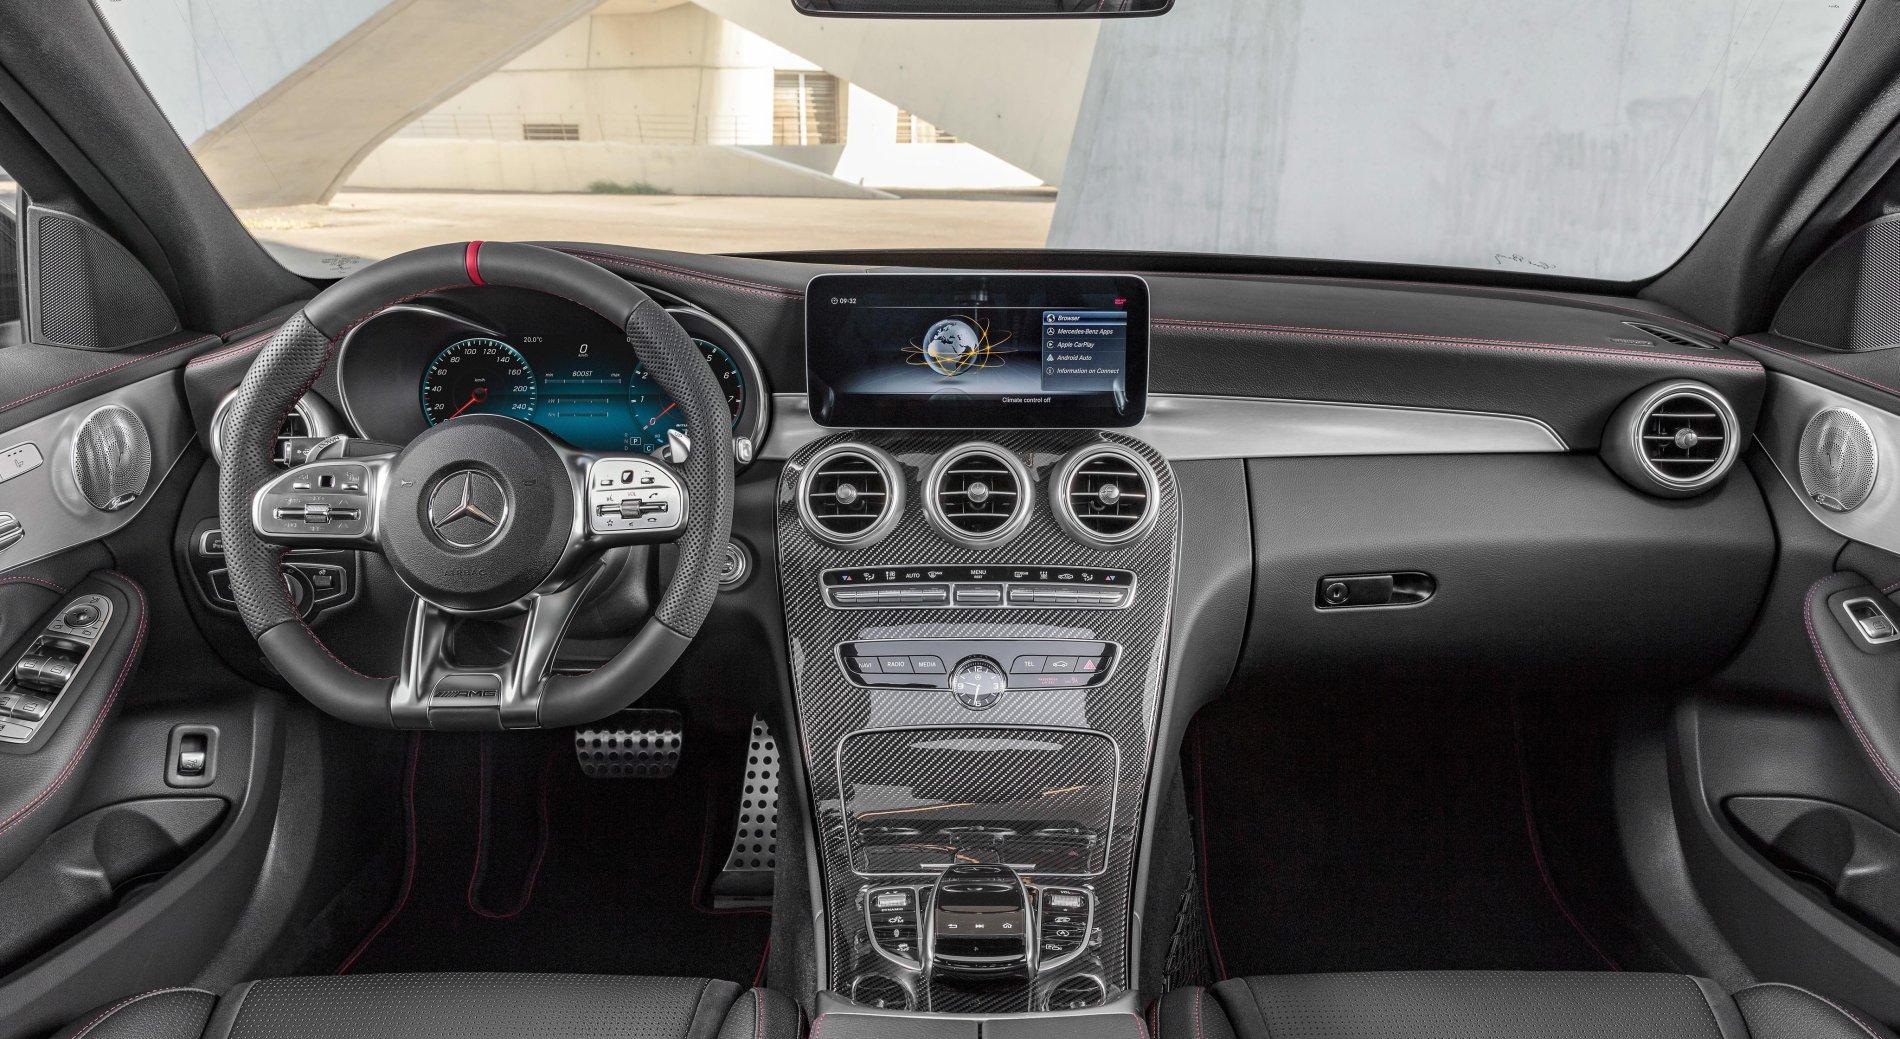 2018 Mercedes-AMG C43 AMG - 2018 Mercedes-AMG C43 AMG